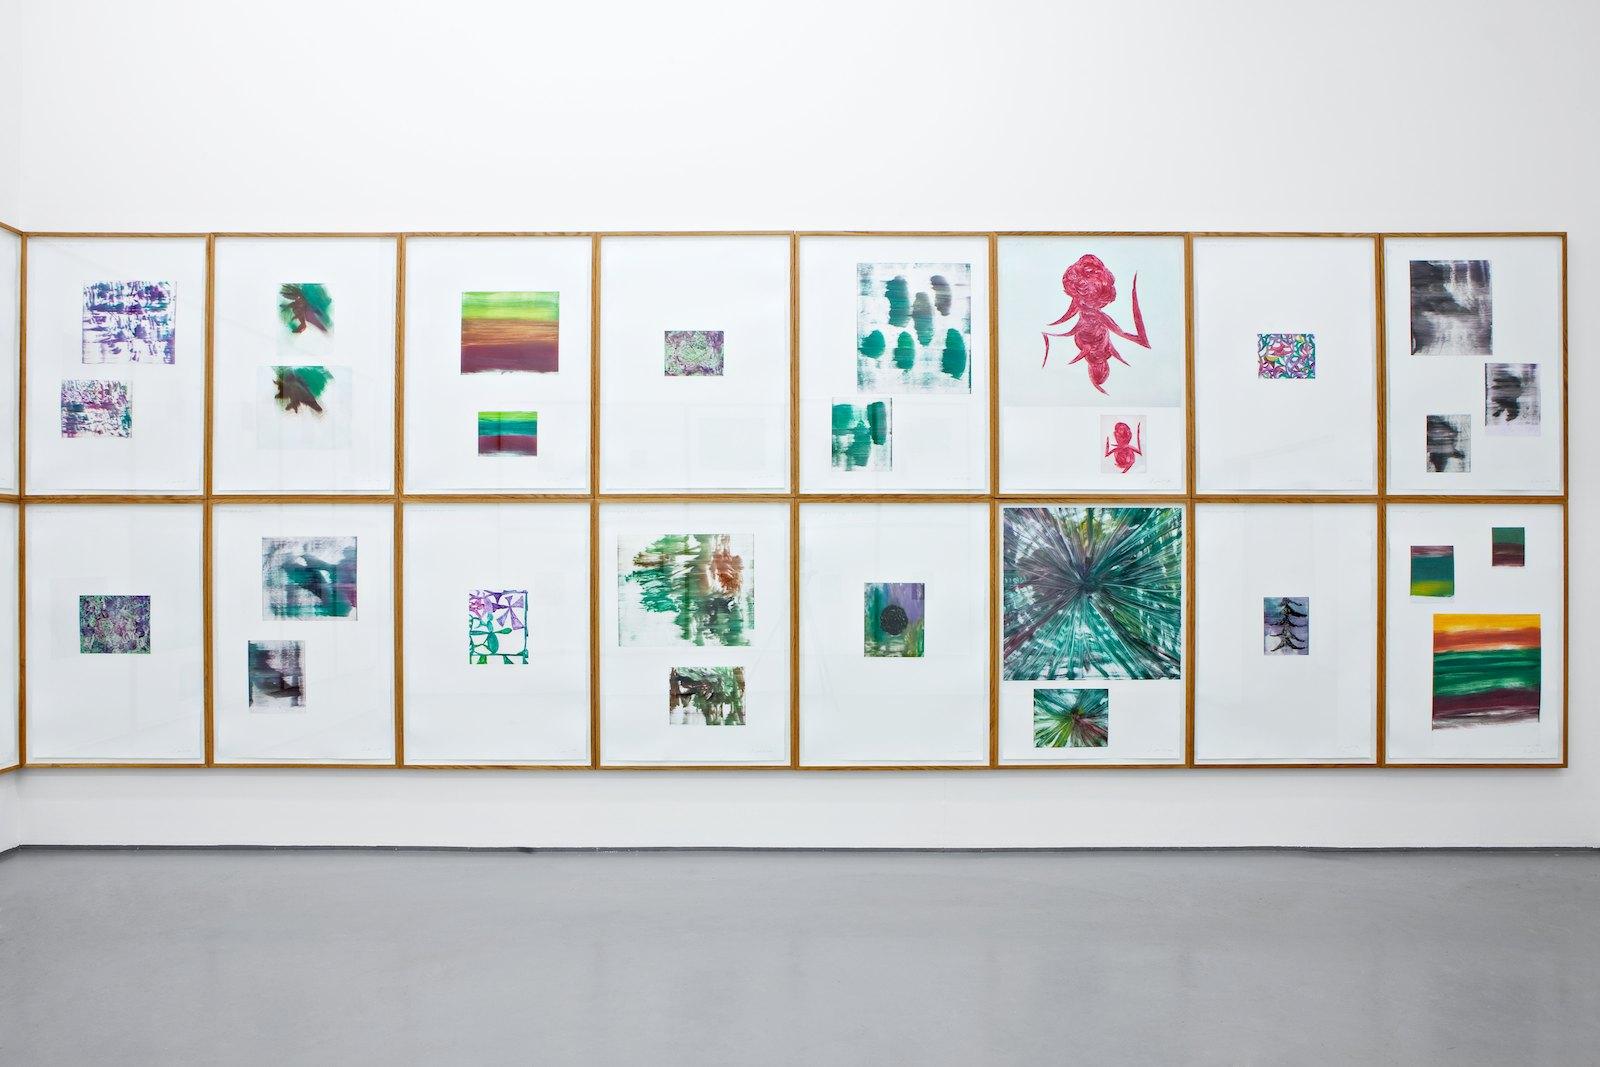 The Living Room, 2011, monotypes, each print 112 x 78 cm